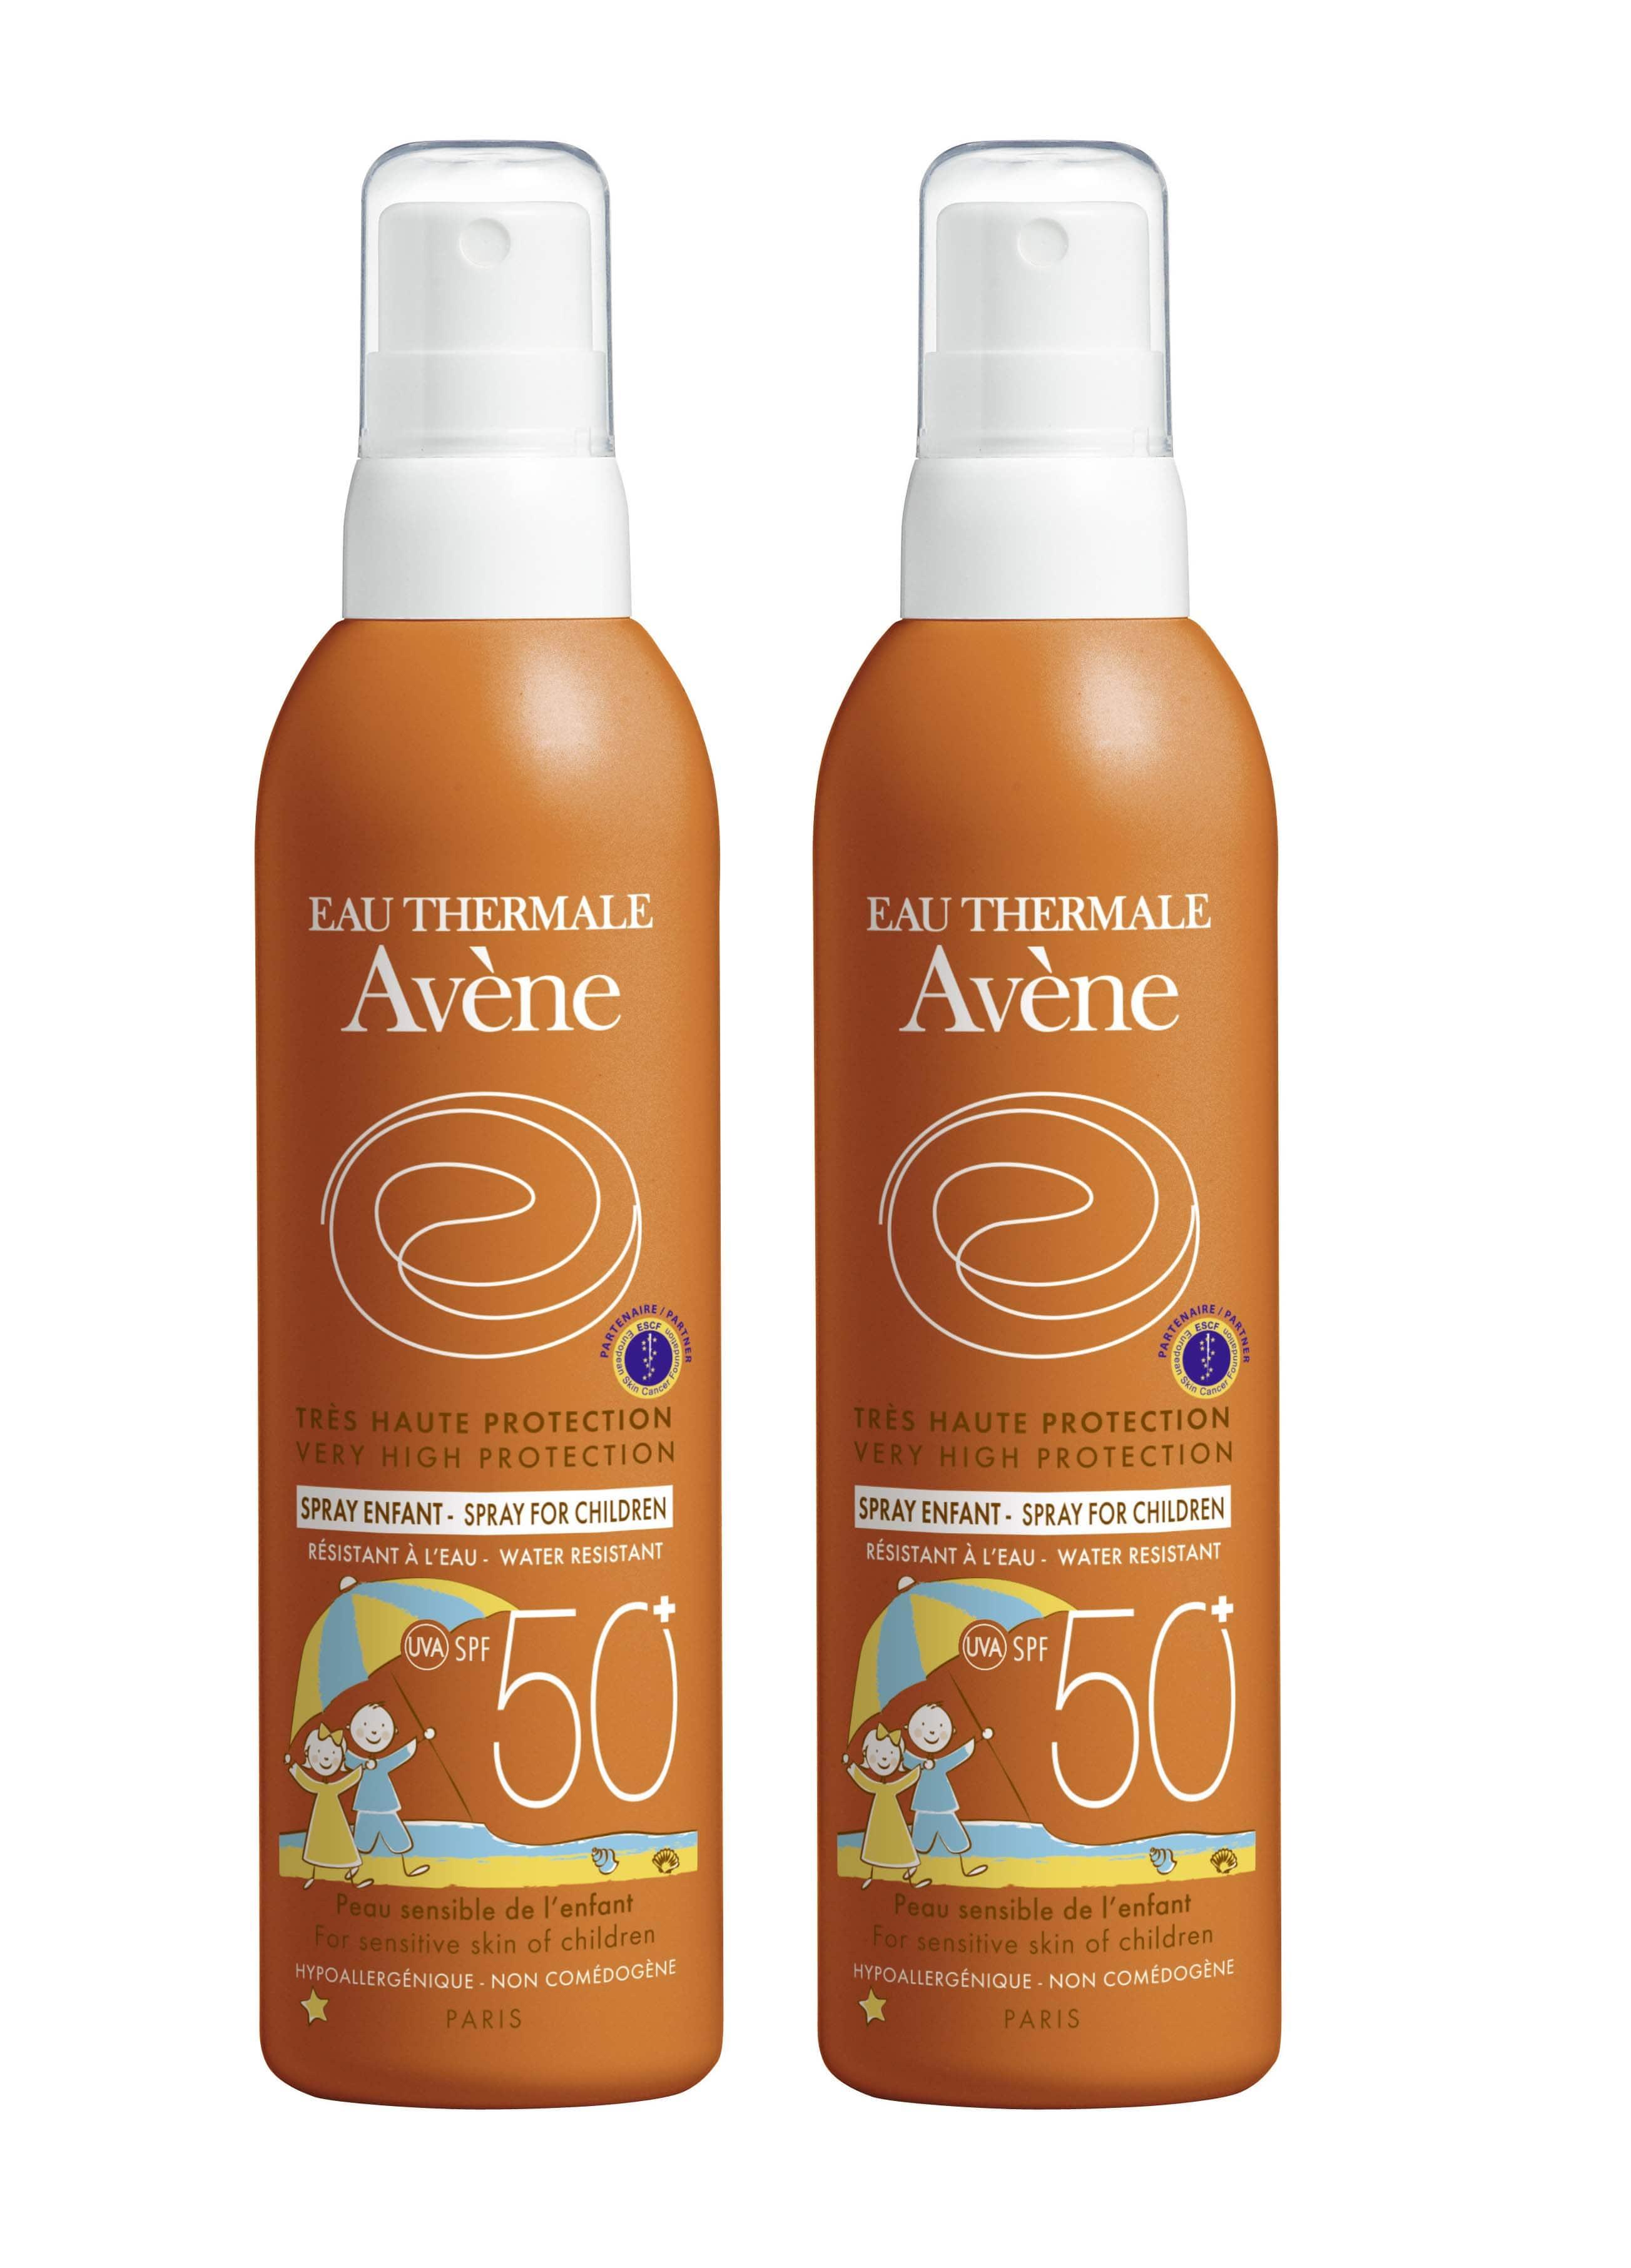 2 x Avene Eau Thermale Spray Enfant SPF50+ Αντιηλιακό παιδικό Σπρέι για Παιδιά, 2 x 200ml